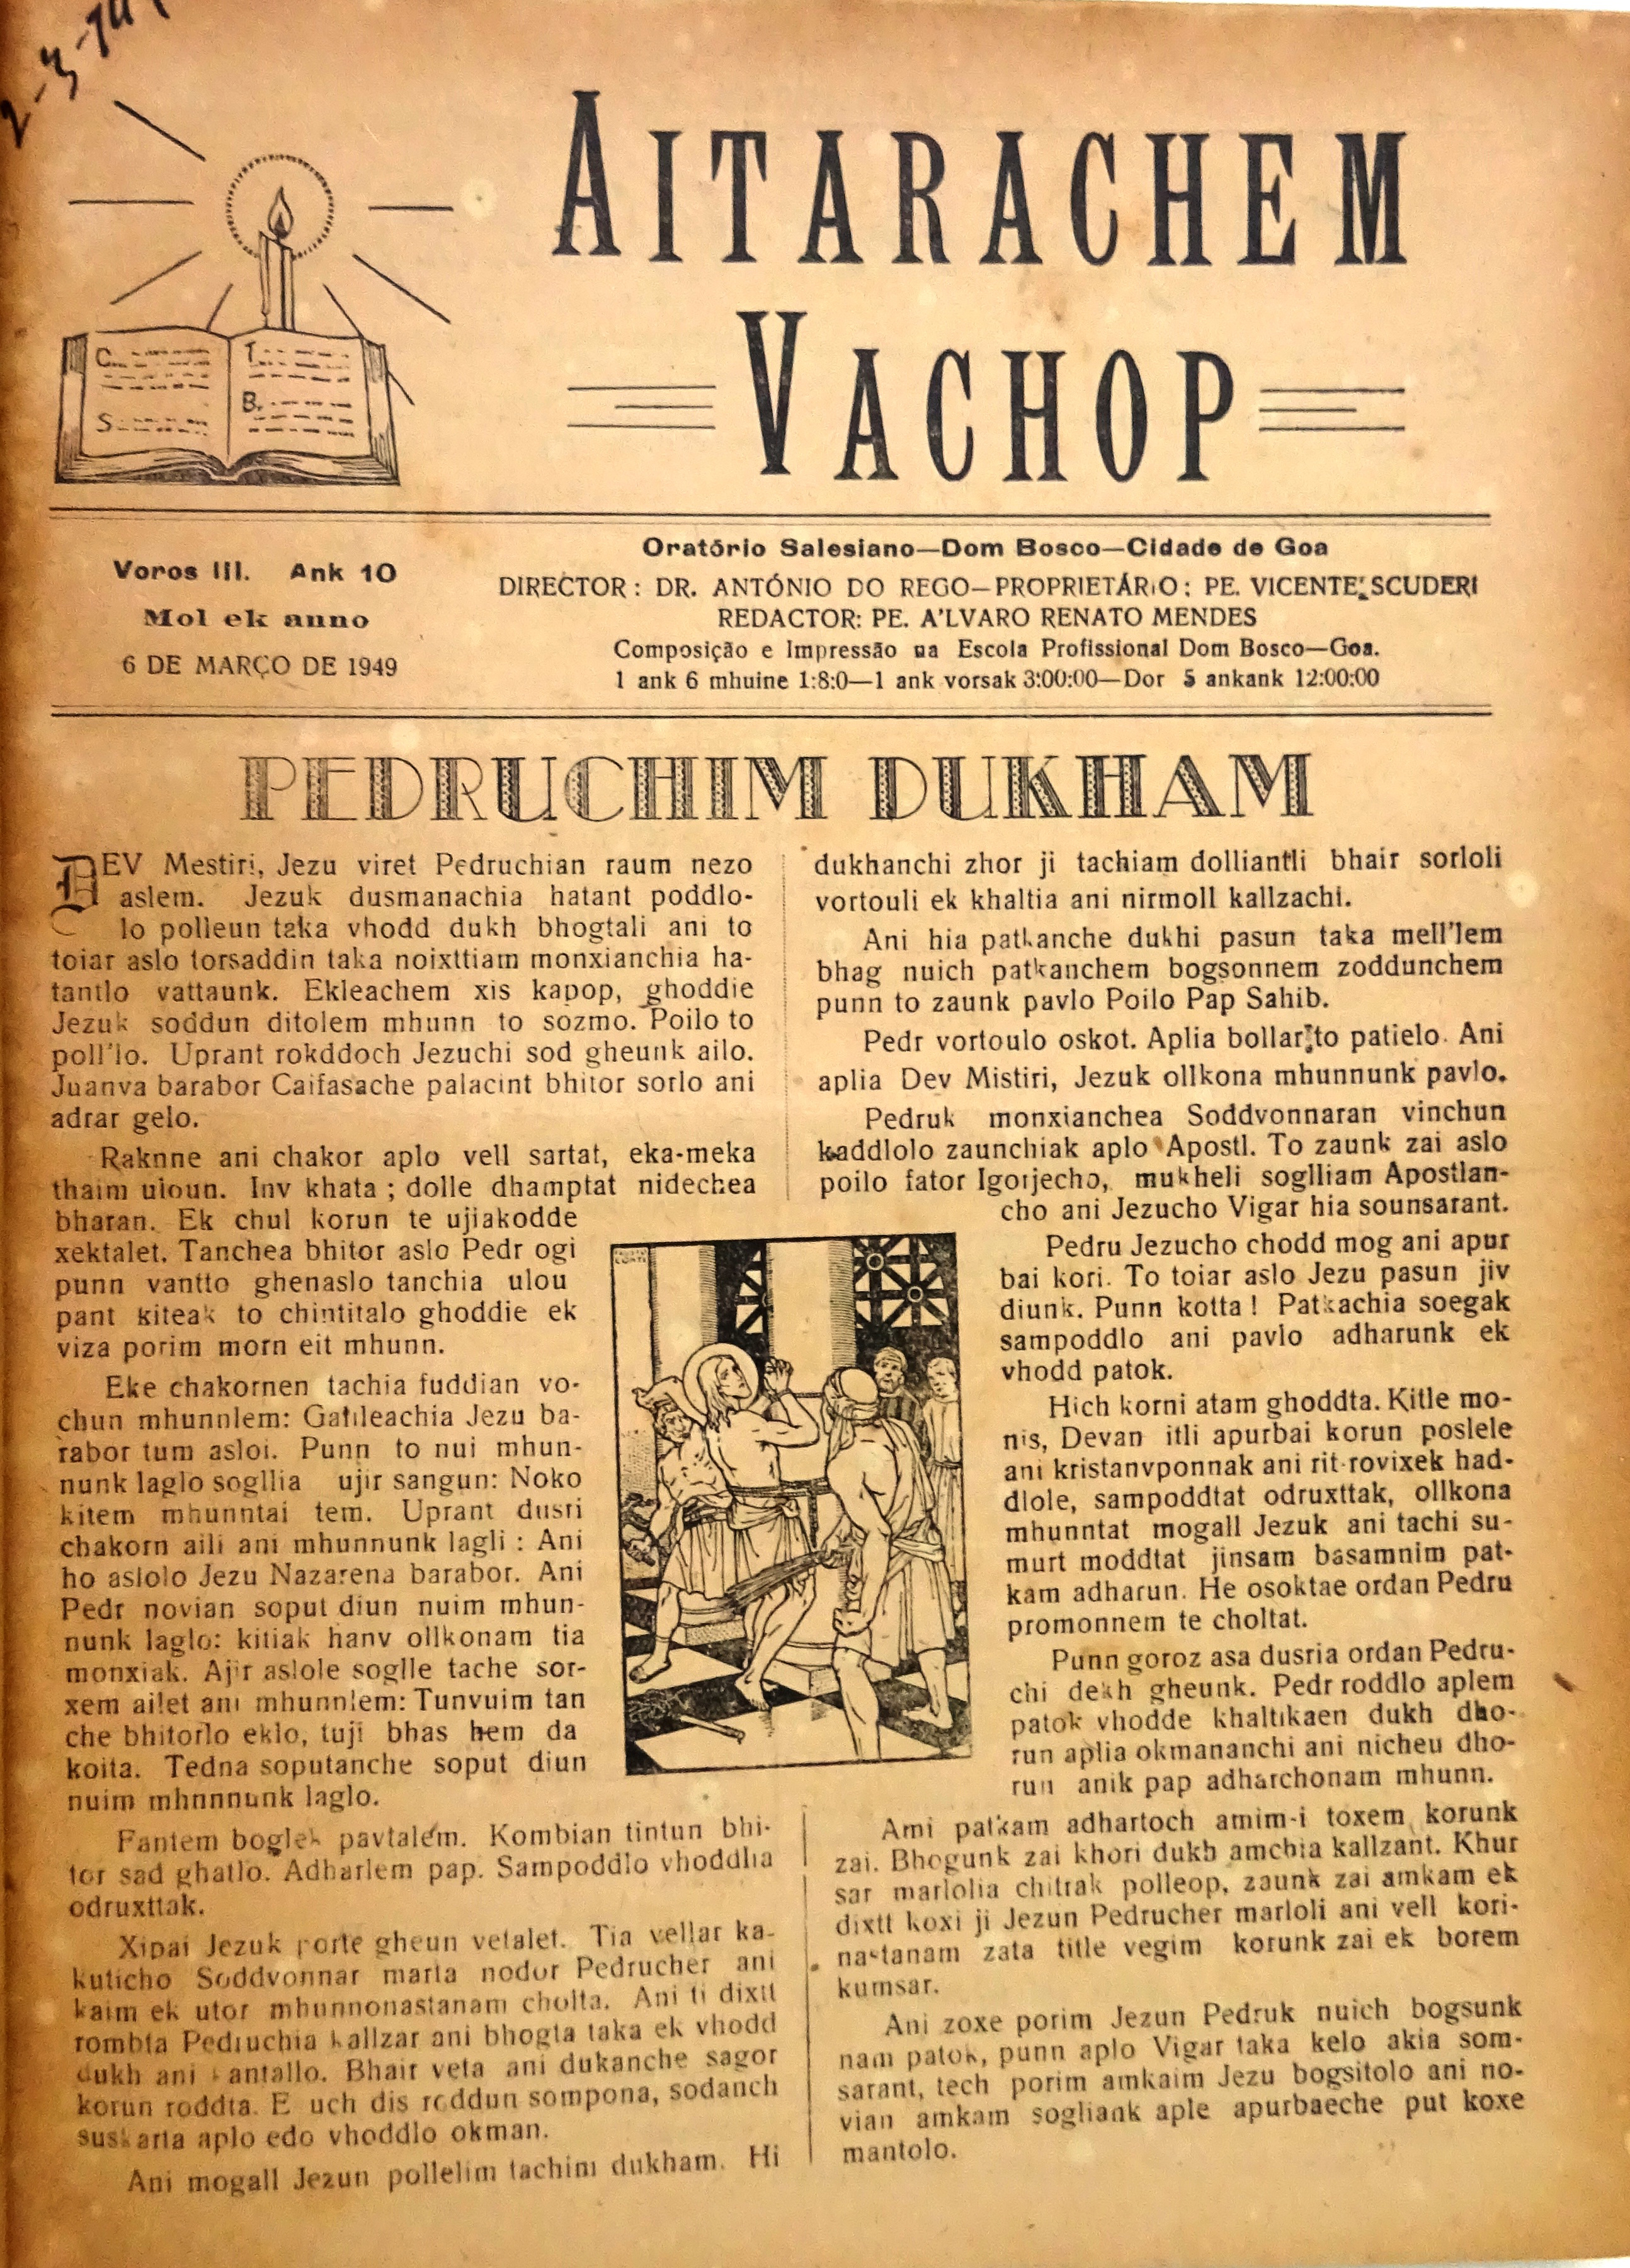 Aitarachem Vachop 3 copy